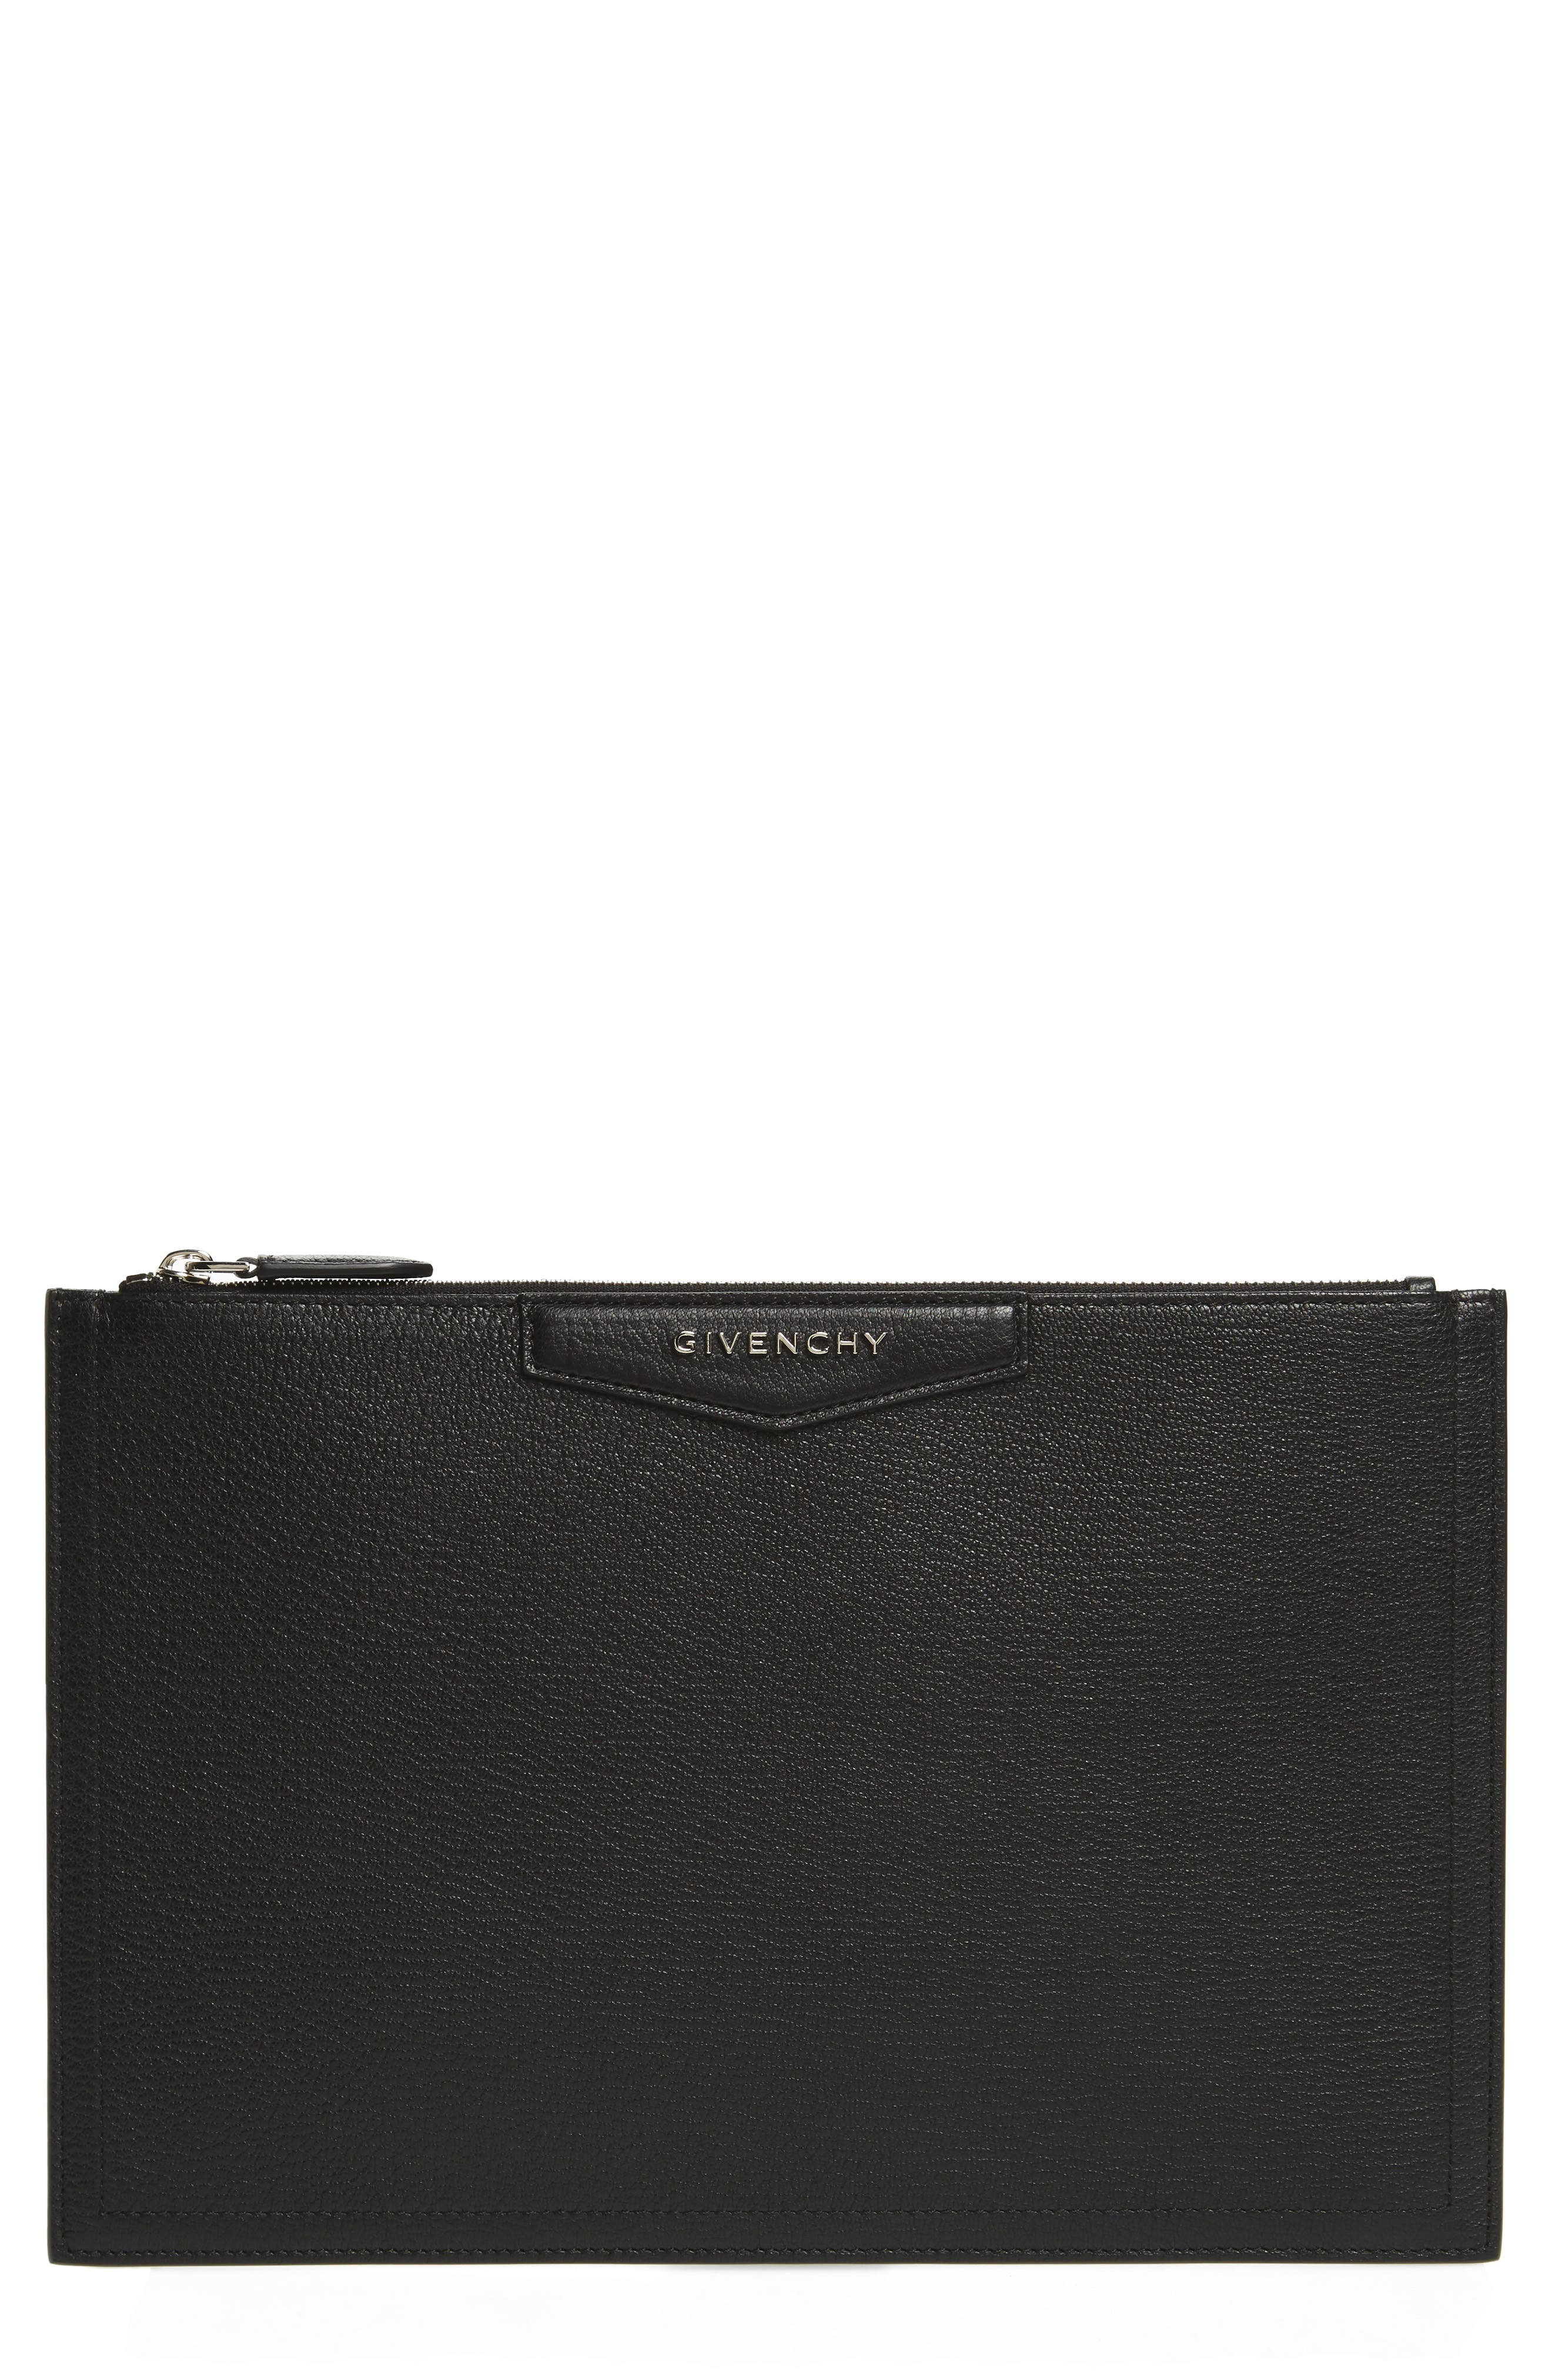 Givenchy Medium Antigona Leather Pouch | Nordstrom